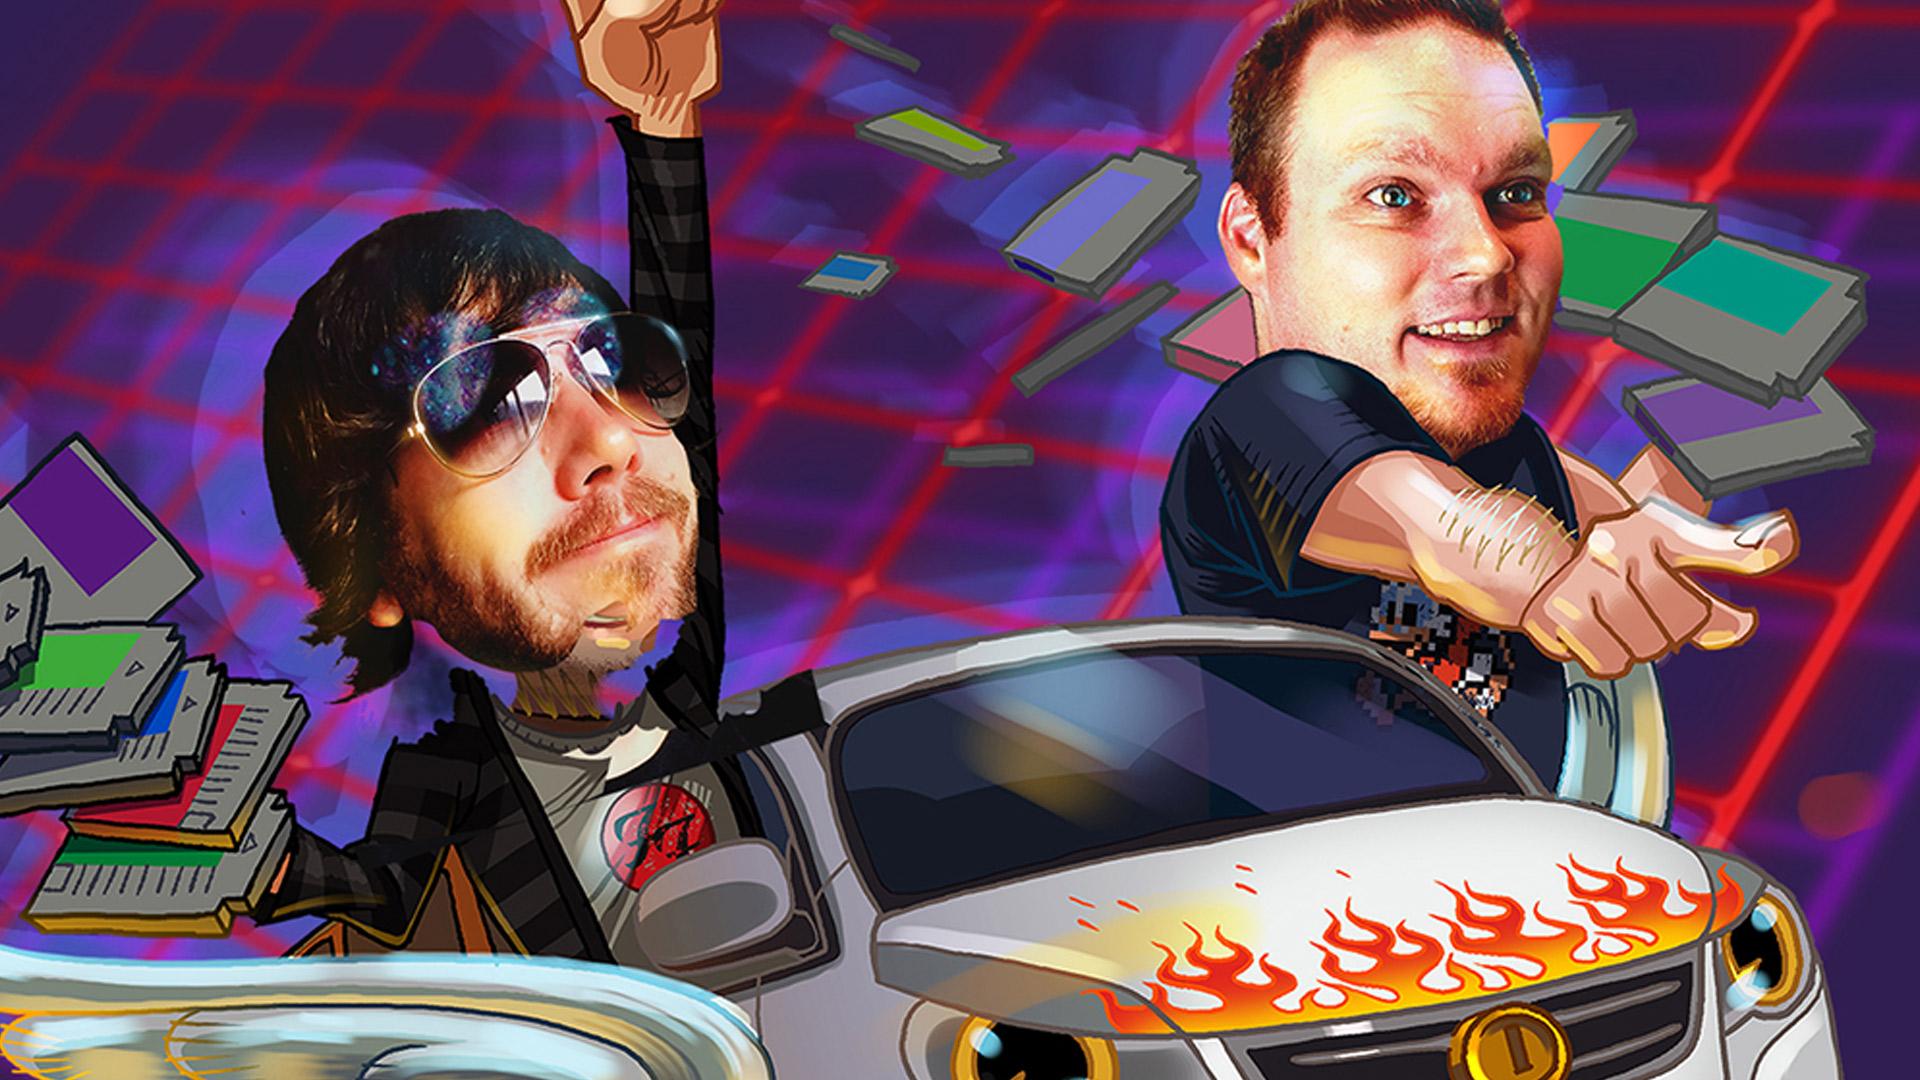 Filmmaker Robert McCallum Talks Nintendo Quest, Retro Gaming